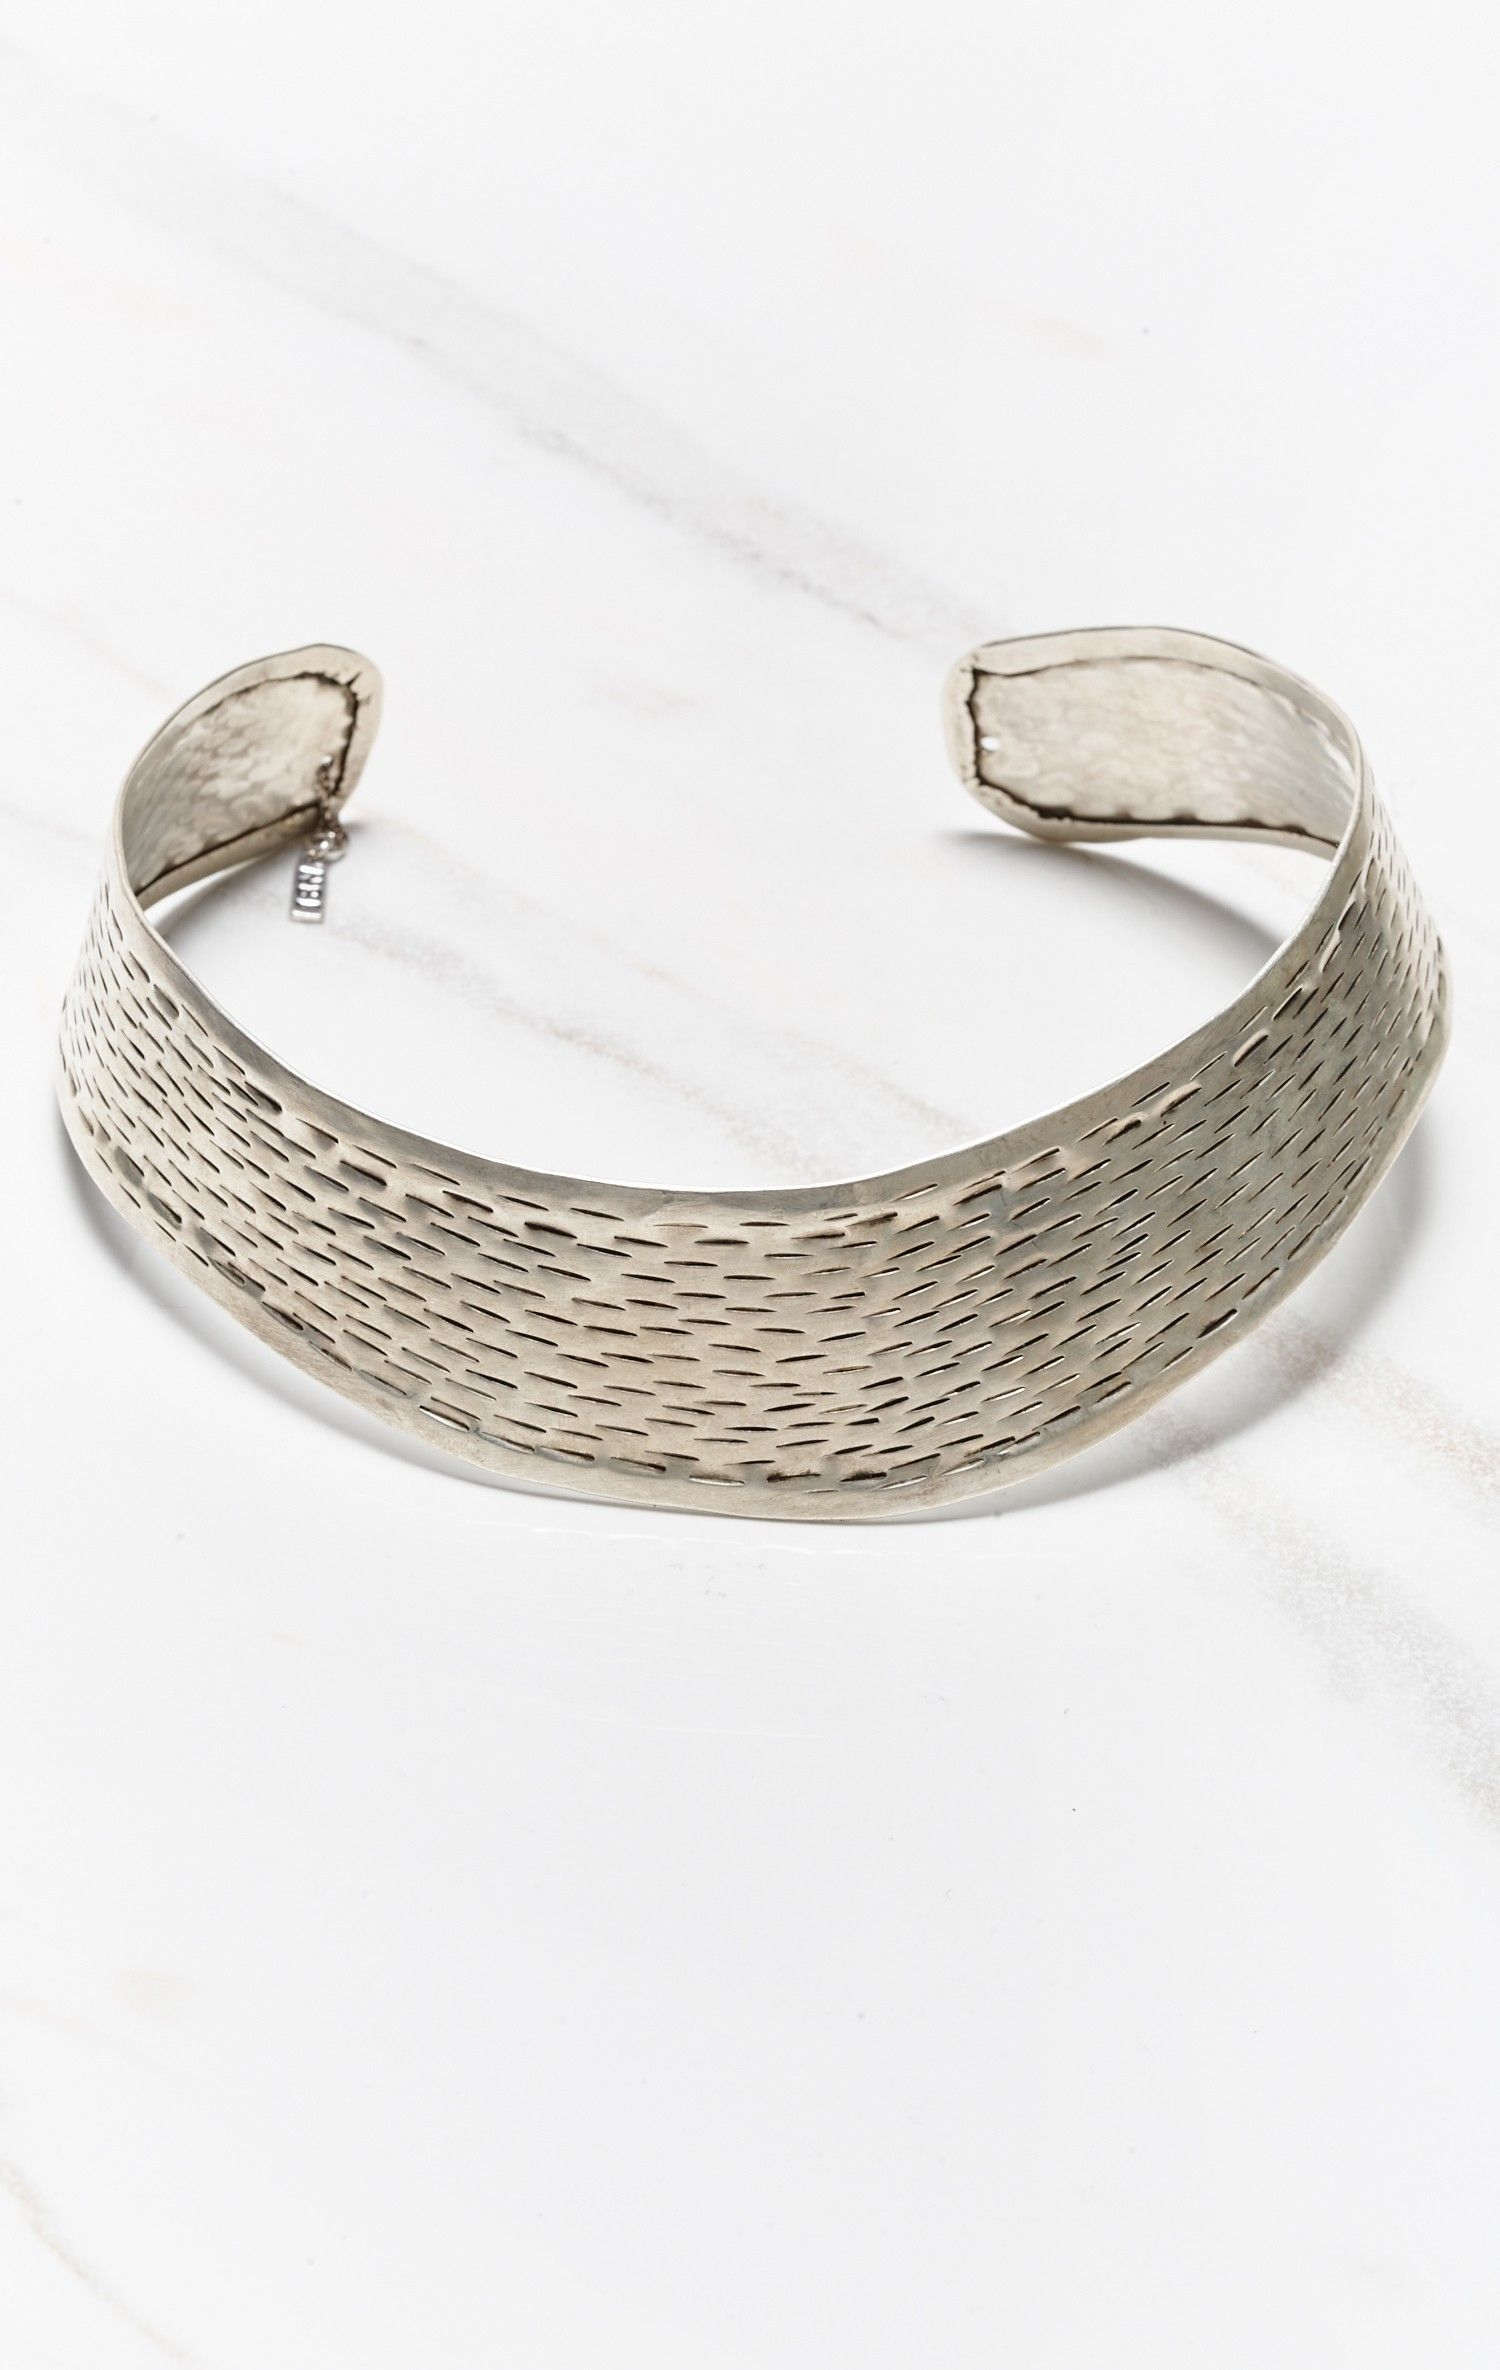 Natalie B Jewelry The Yev Collar in Metallic Silver CjqsItNT